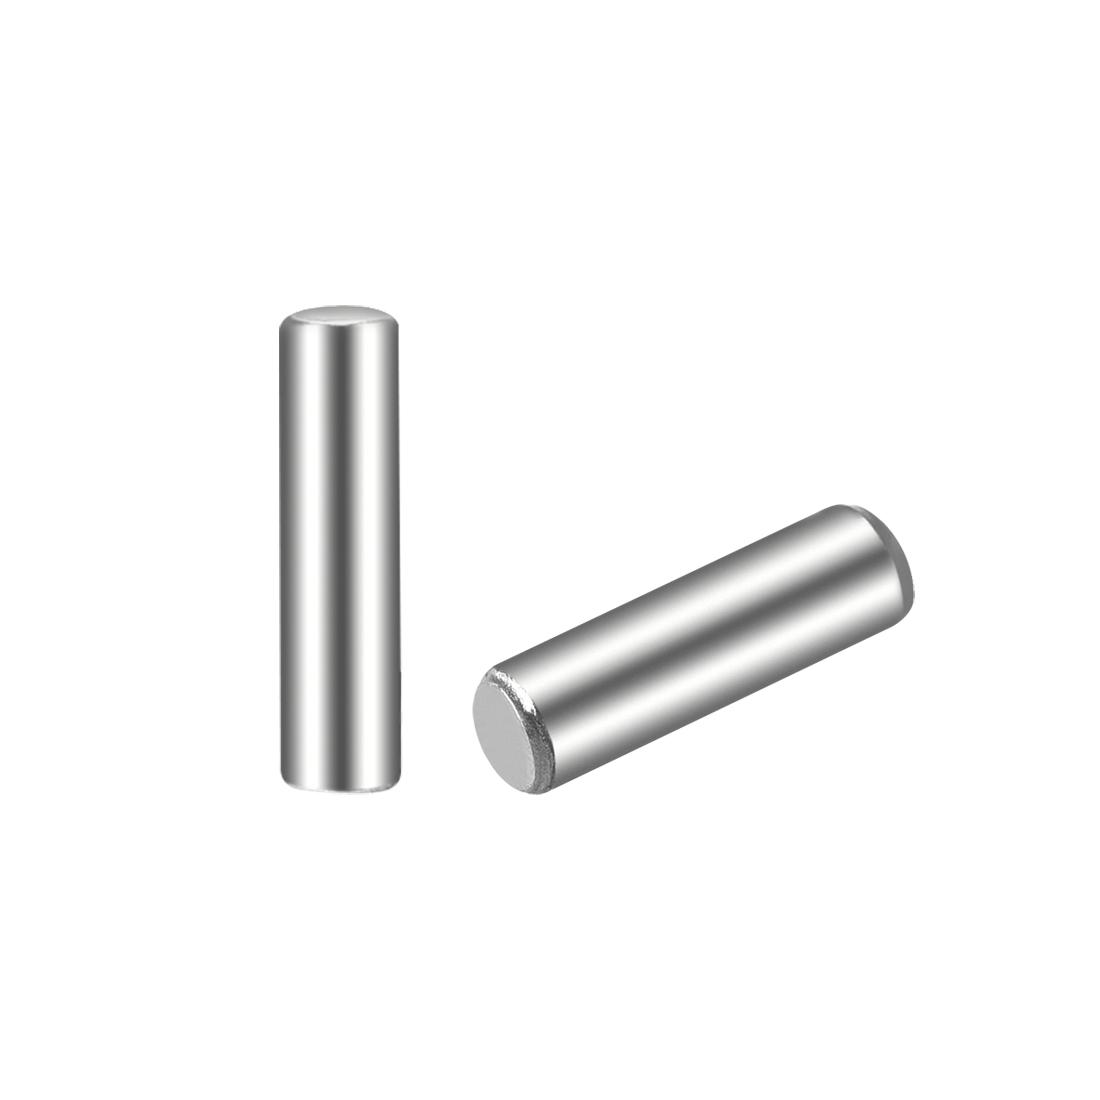 100Pcs 2.5mm x 10mm Dowel Pin 304 Stainless Steel Shelf Support Pin Fasten